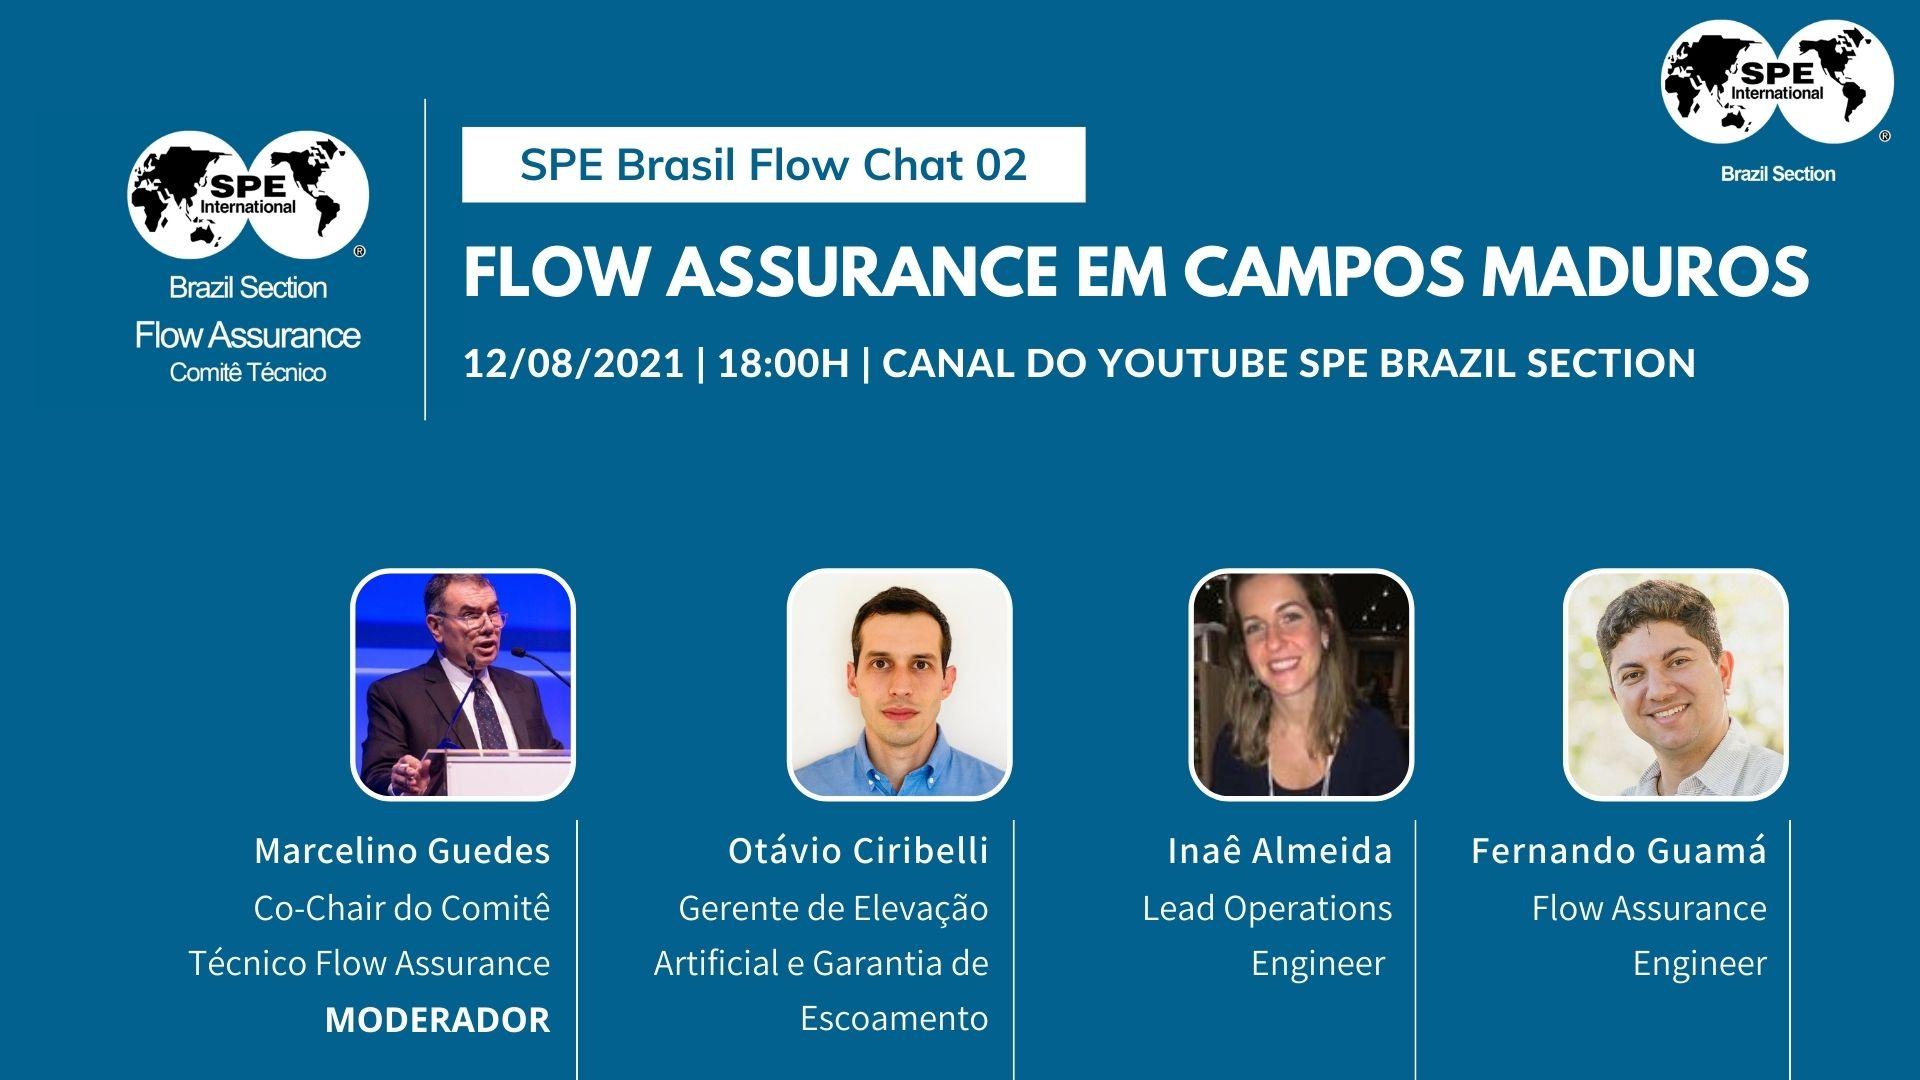 SPE Brasil Flow Chat 02